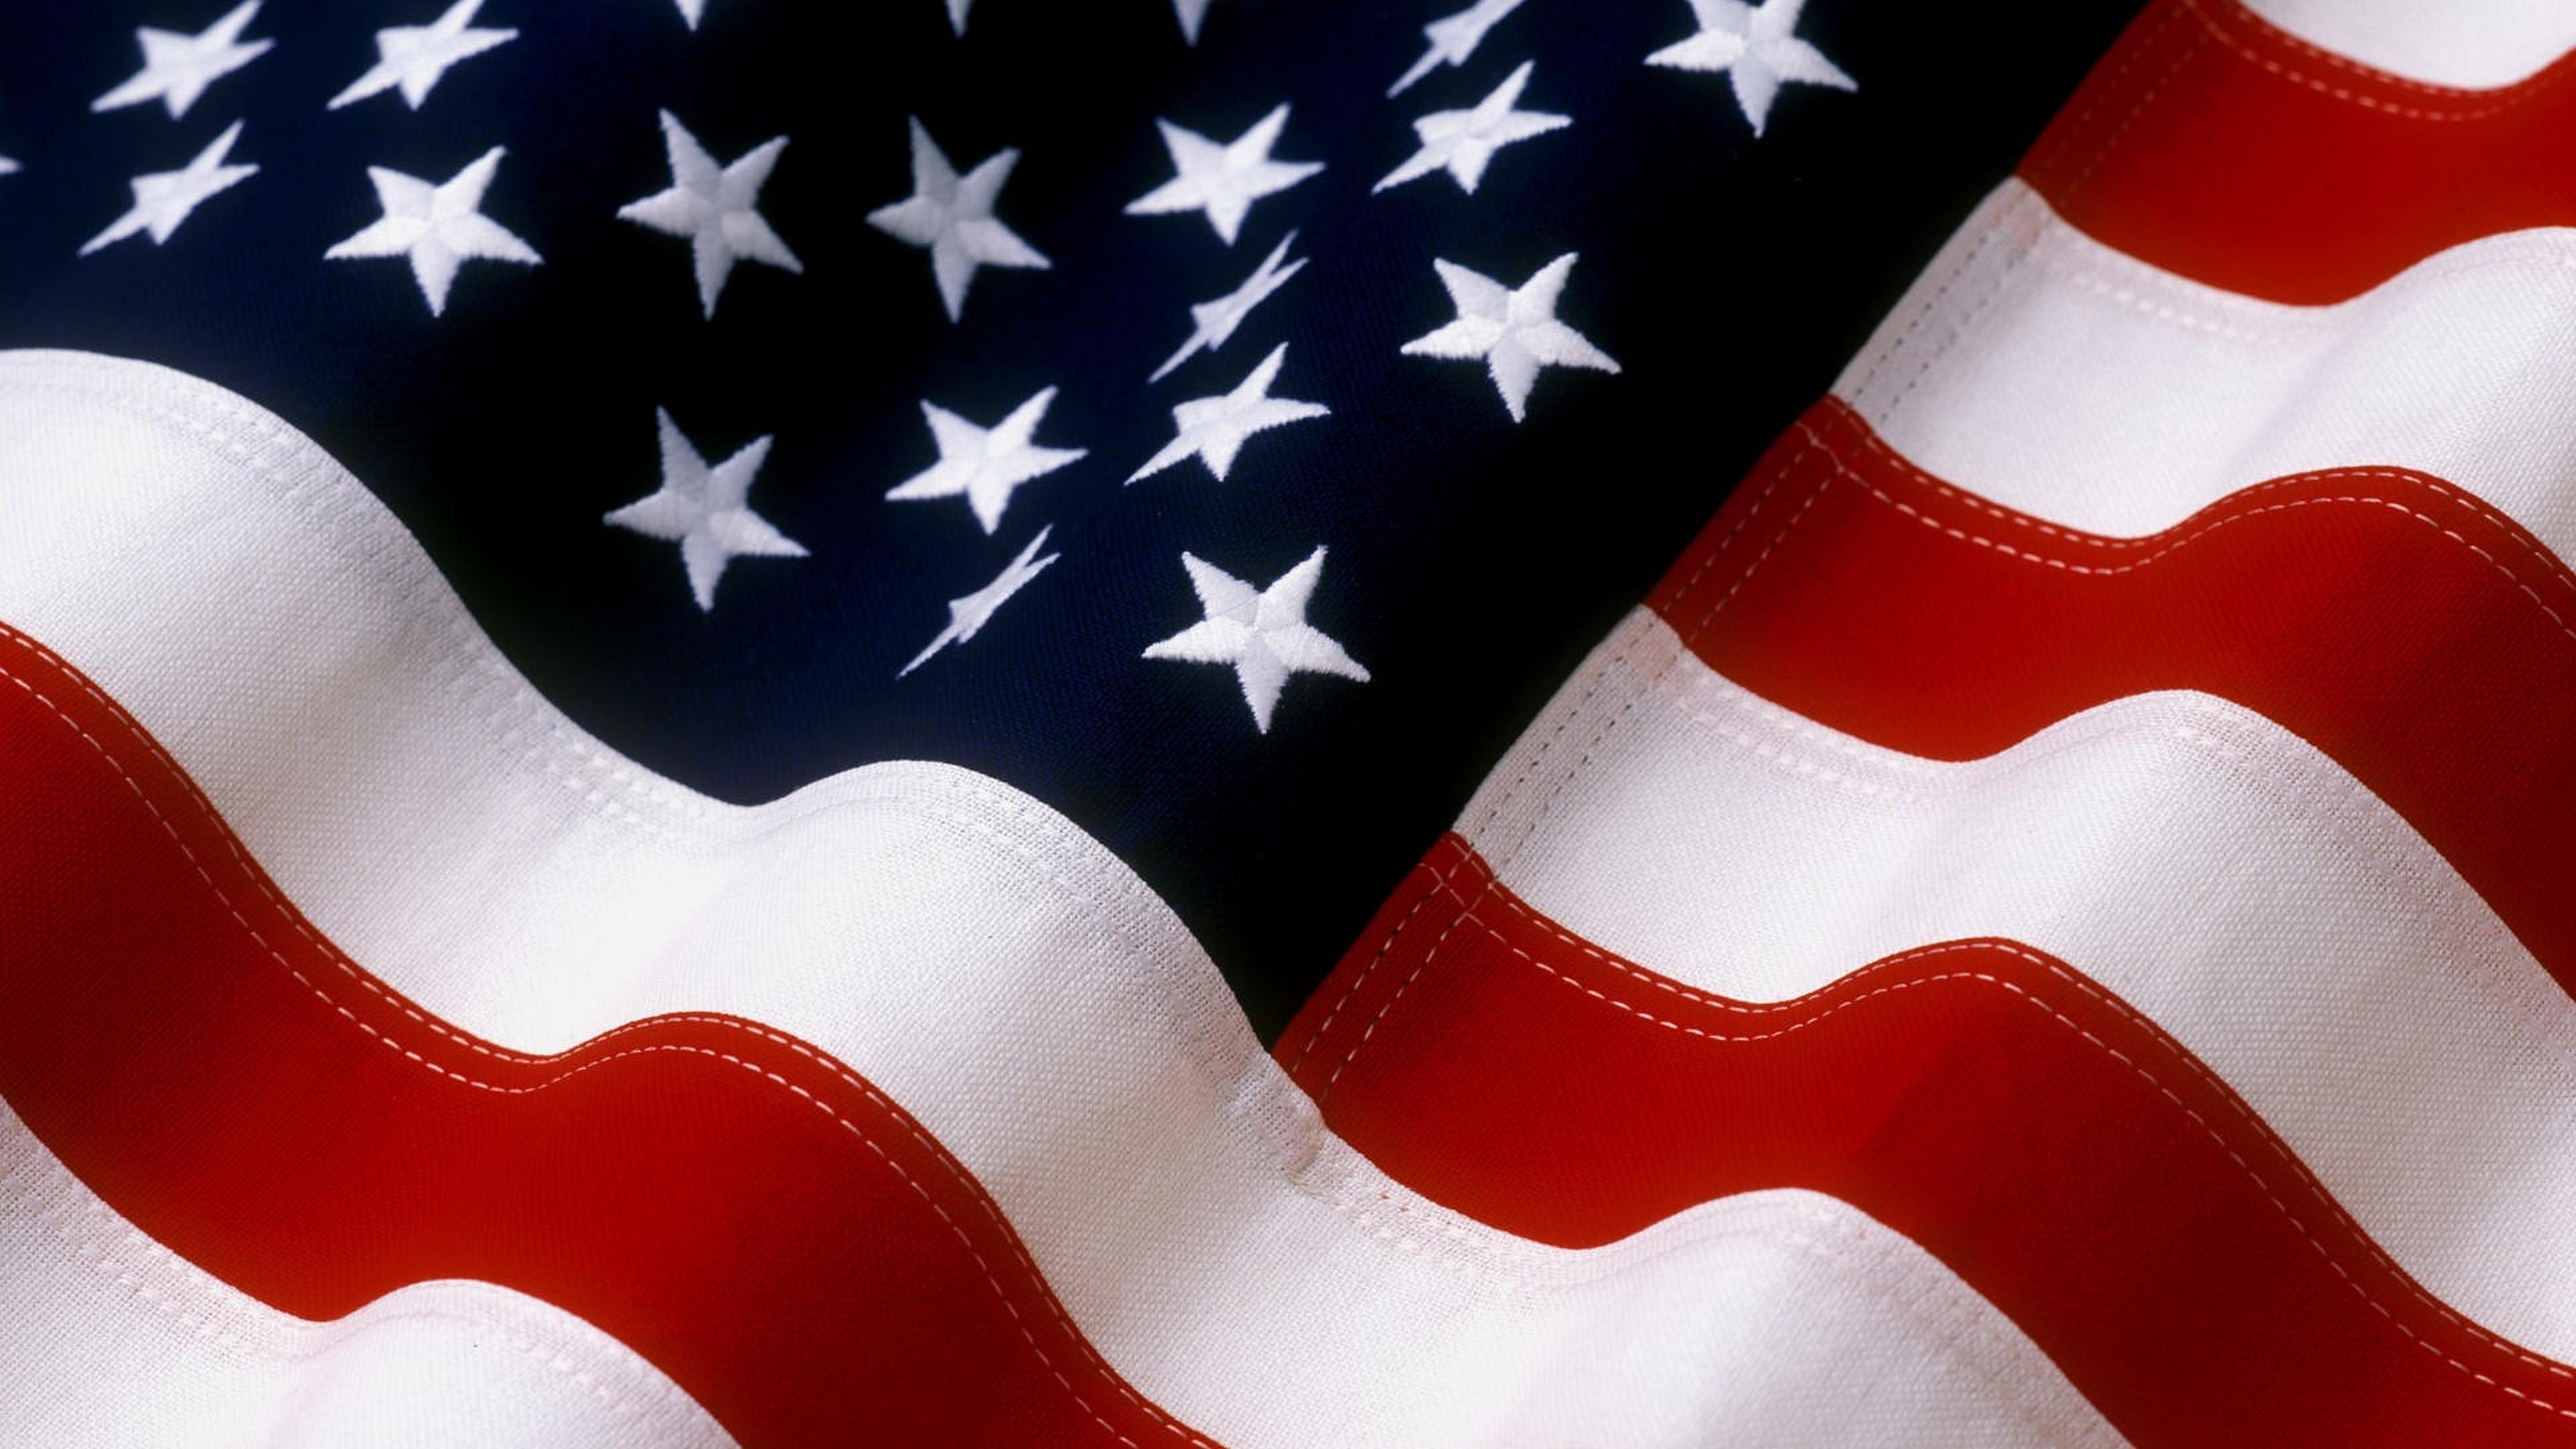 patriotic wallpaper 14885